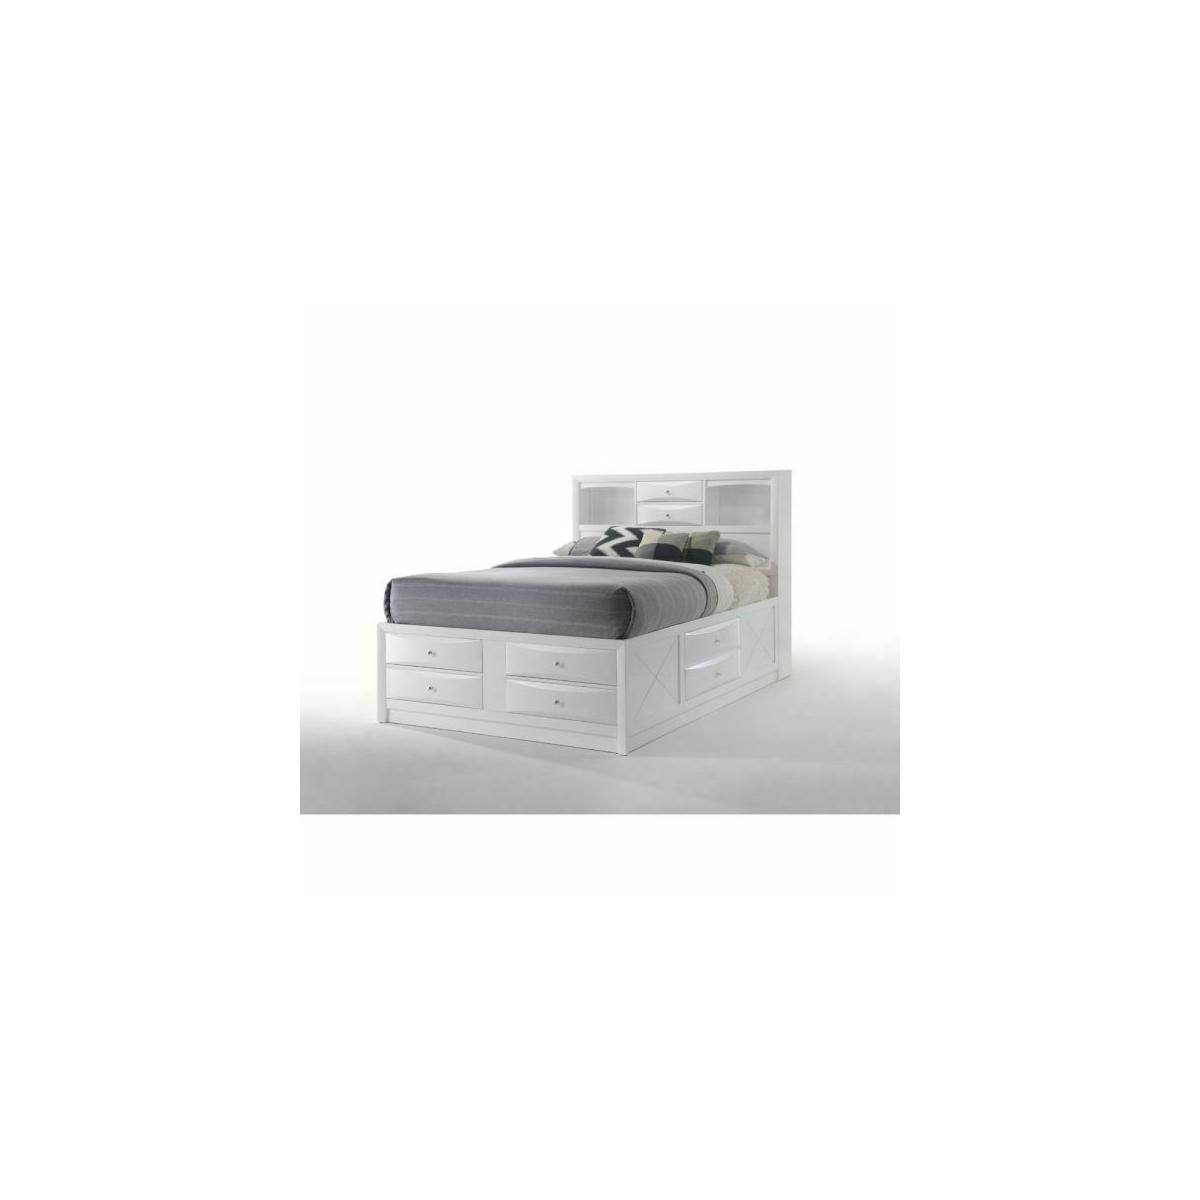 ACME Ireland Eastern King Bed w/Storage - 21696EK - White